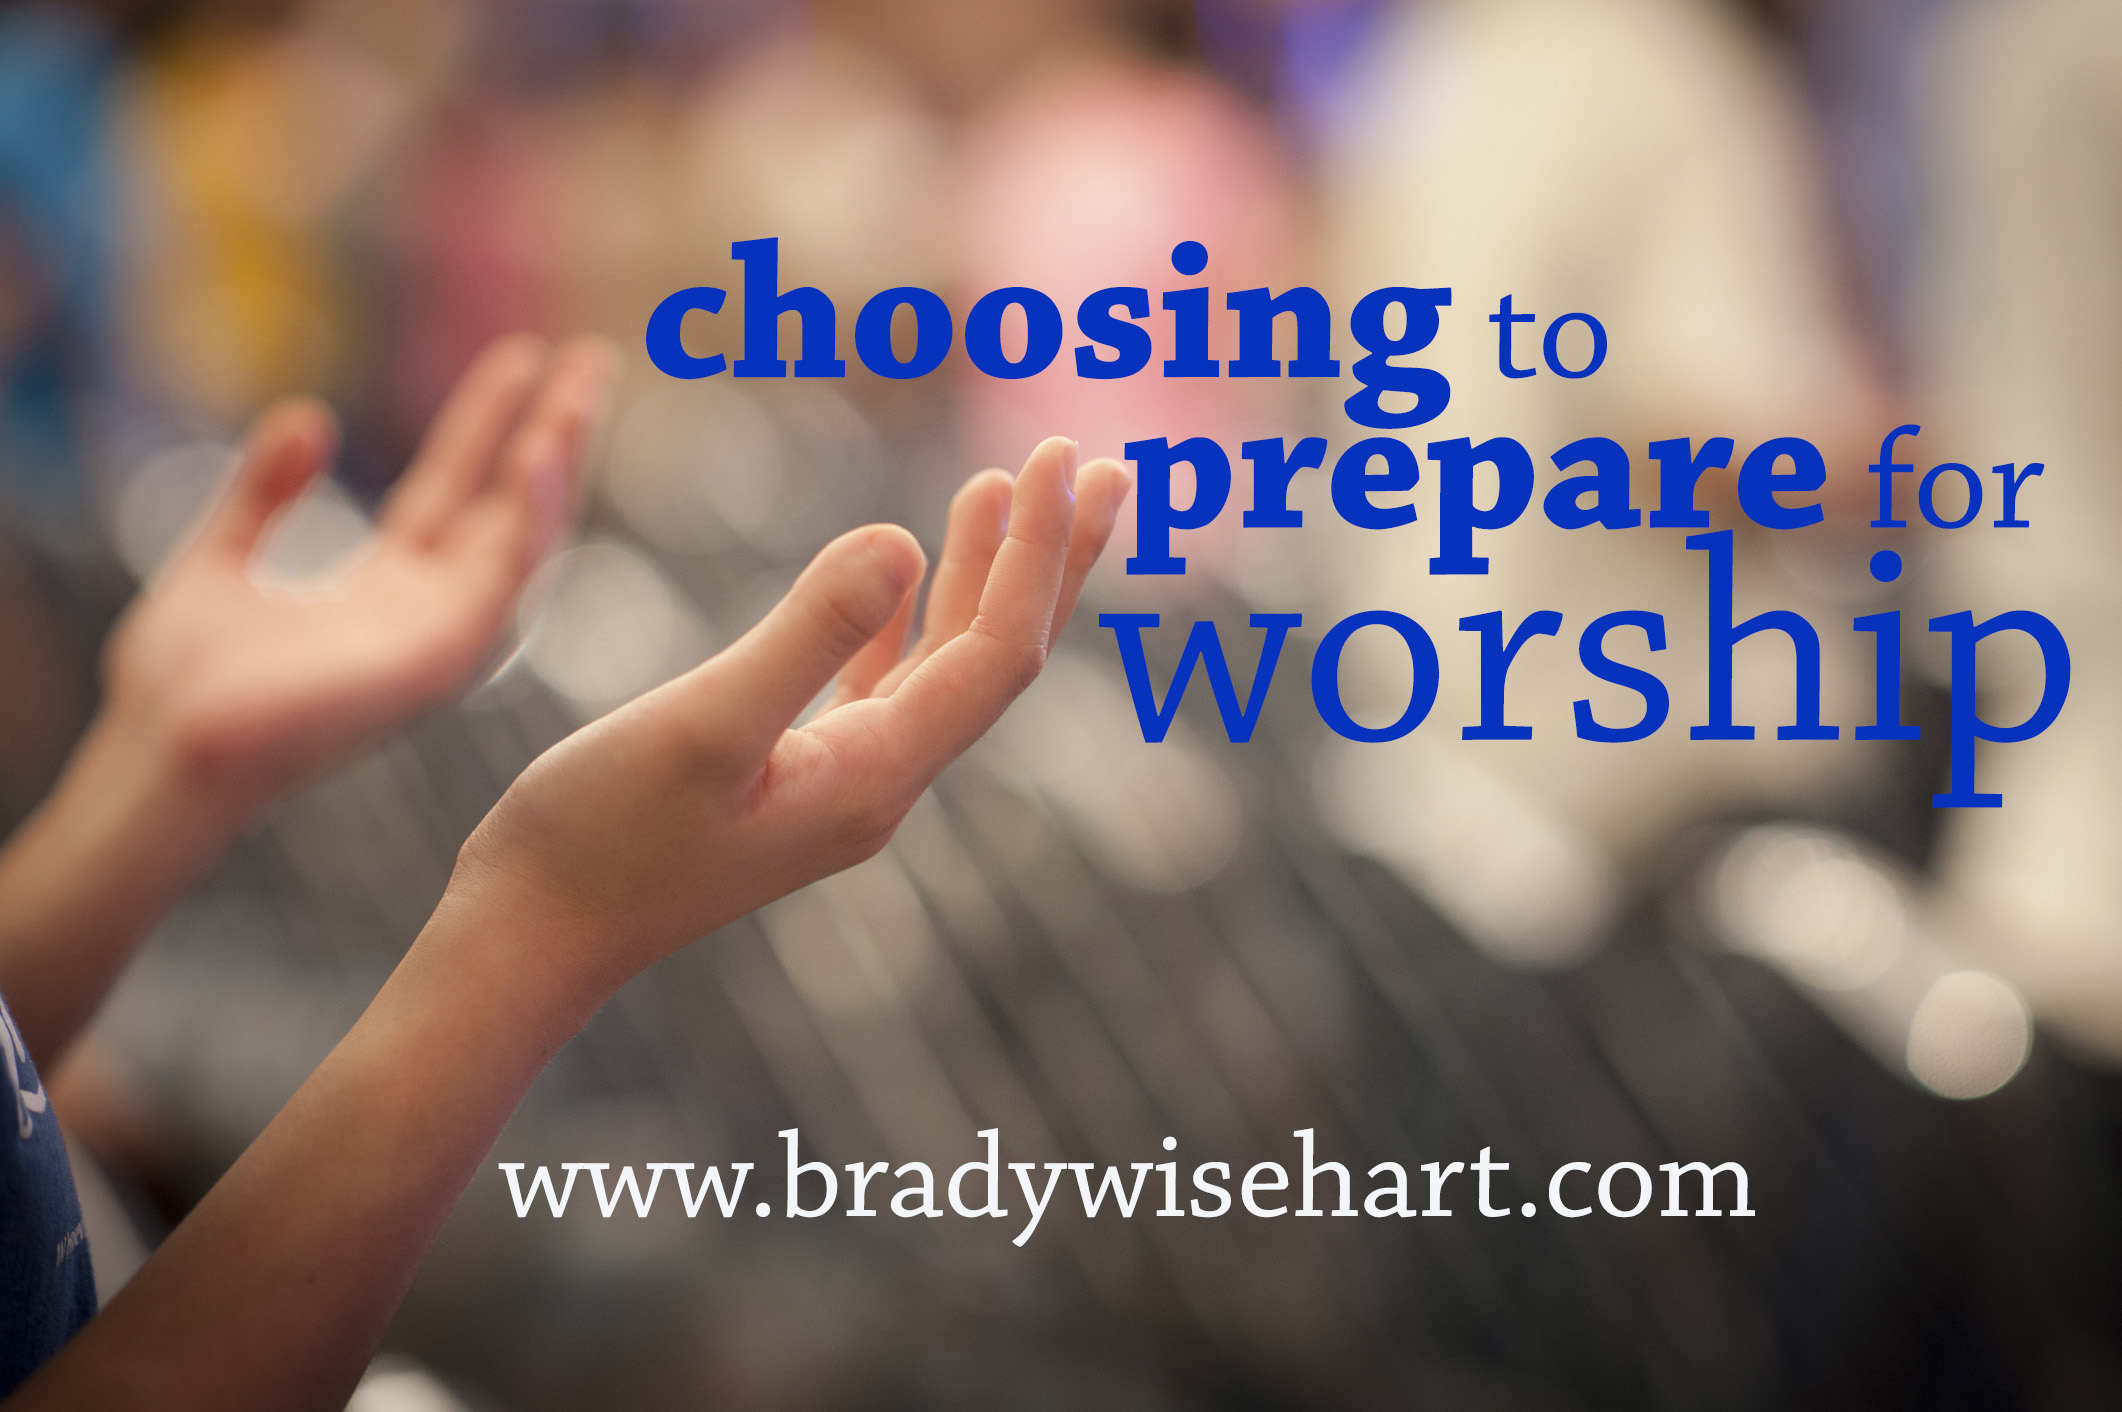 CHOOSING TO PREPARE FOR WORSHIP